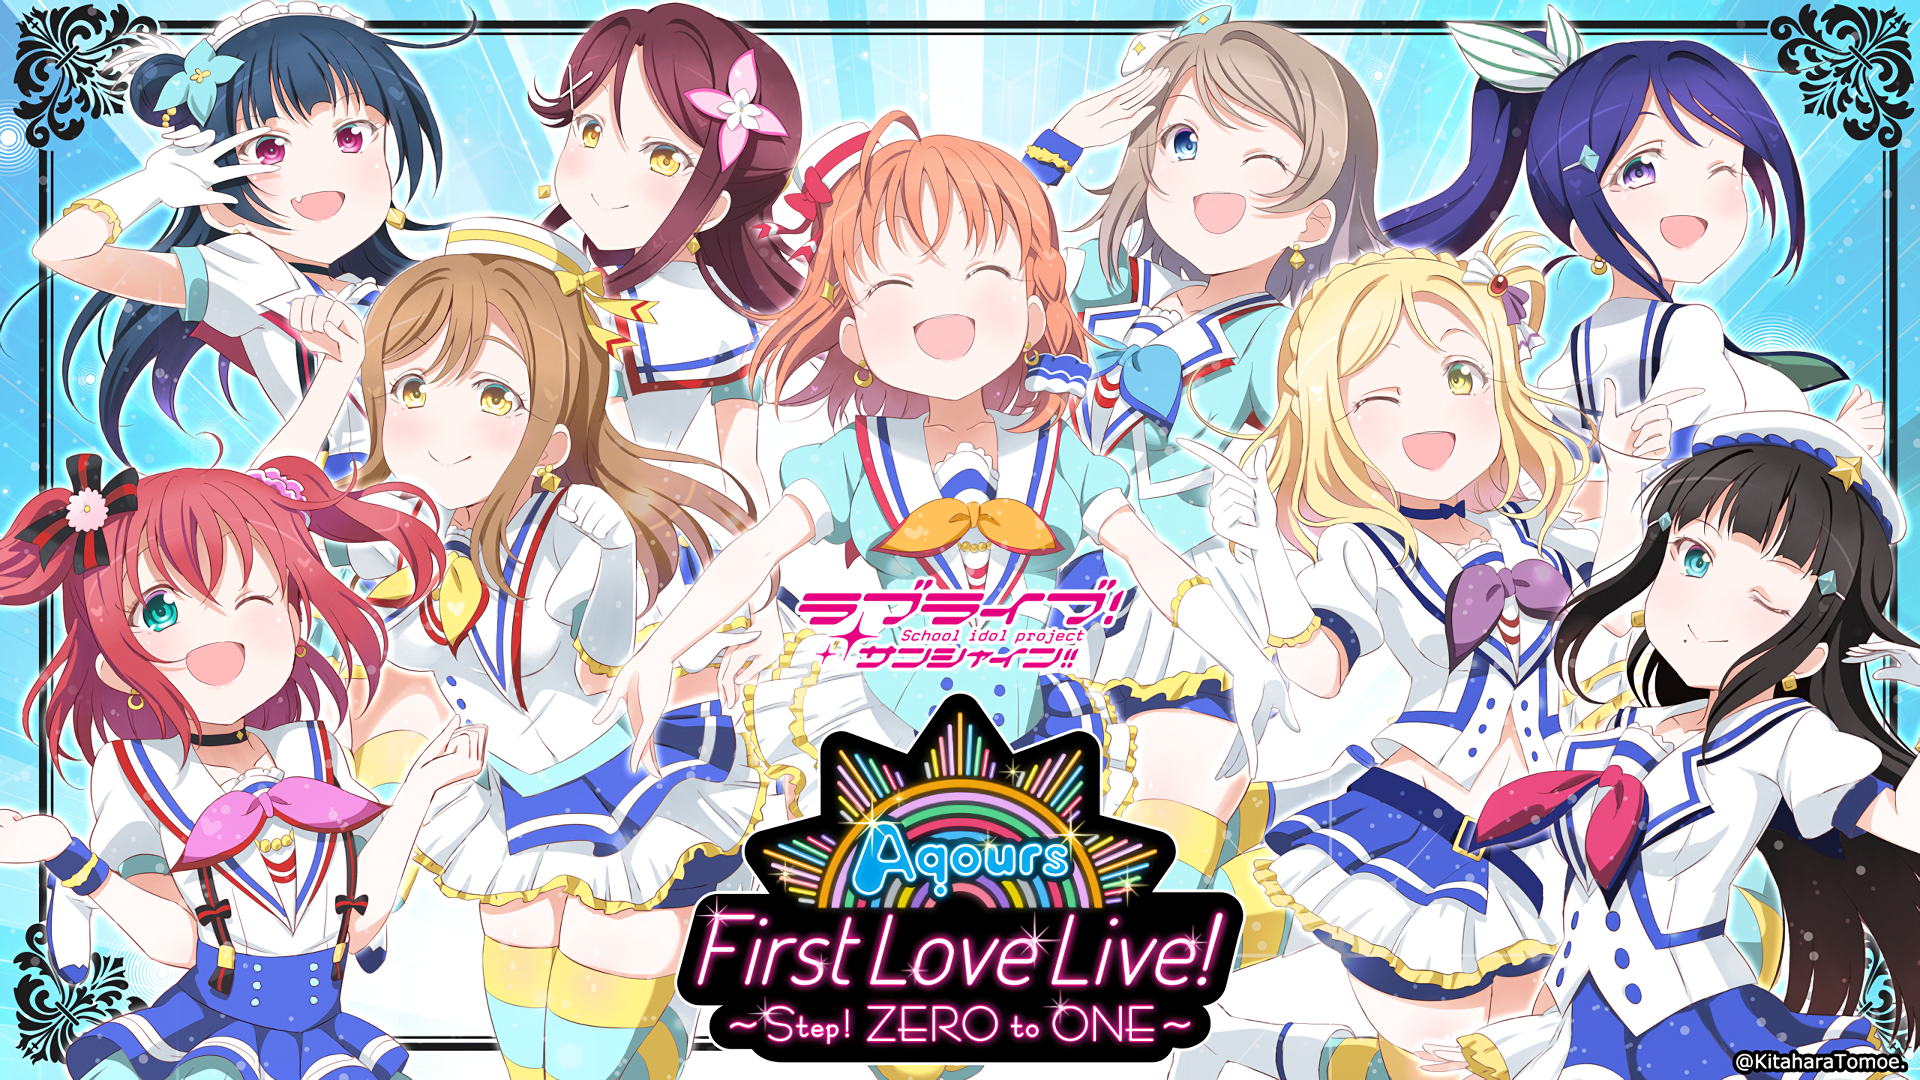 Love Live Wallpaper Hd New: Love Live! Sunshine!! HD Wallpaper